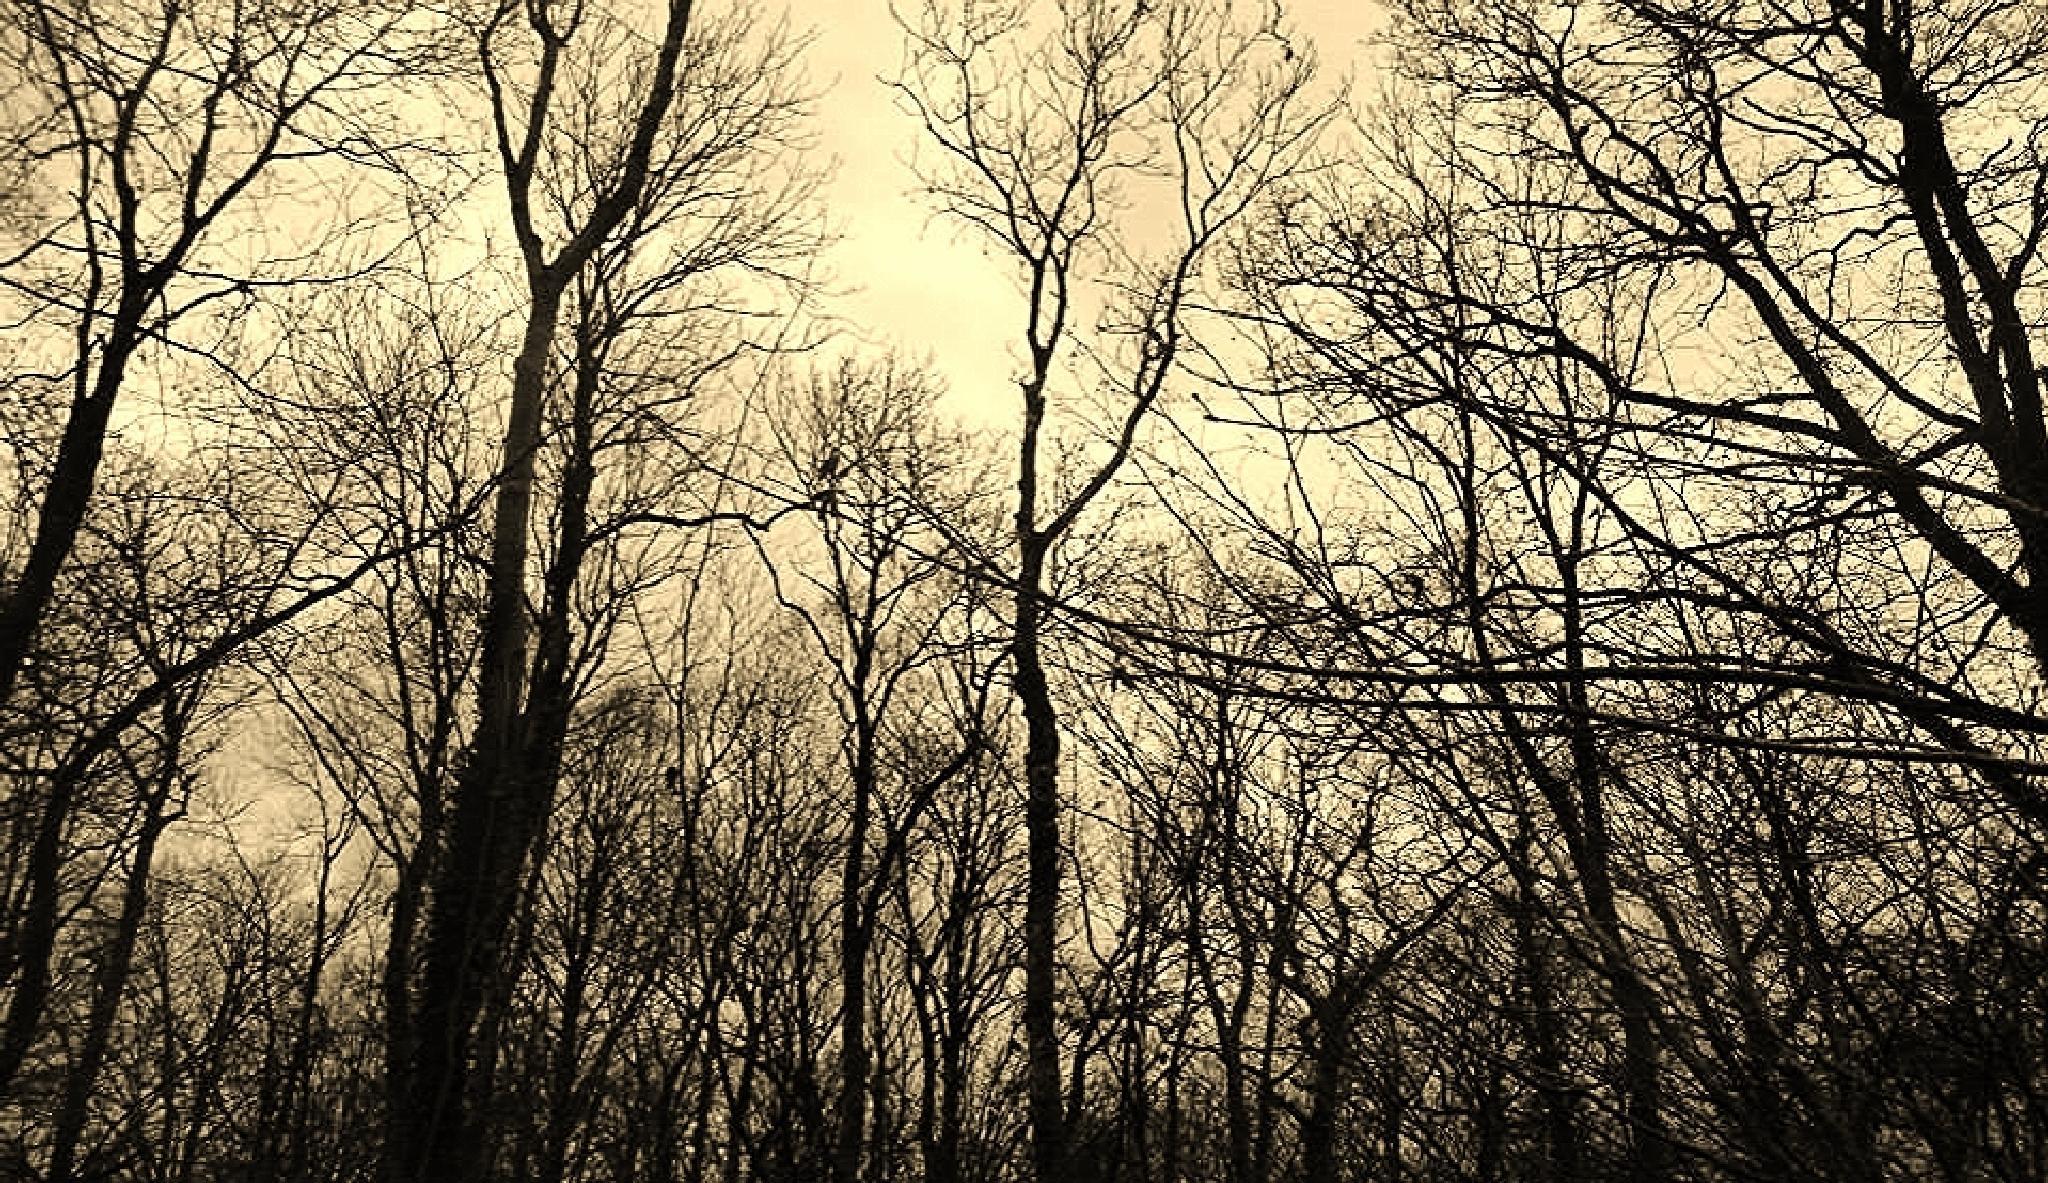 cenarth woods by chris.adams.3557